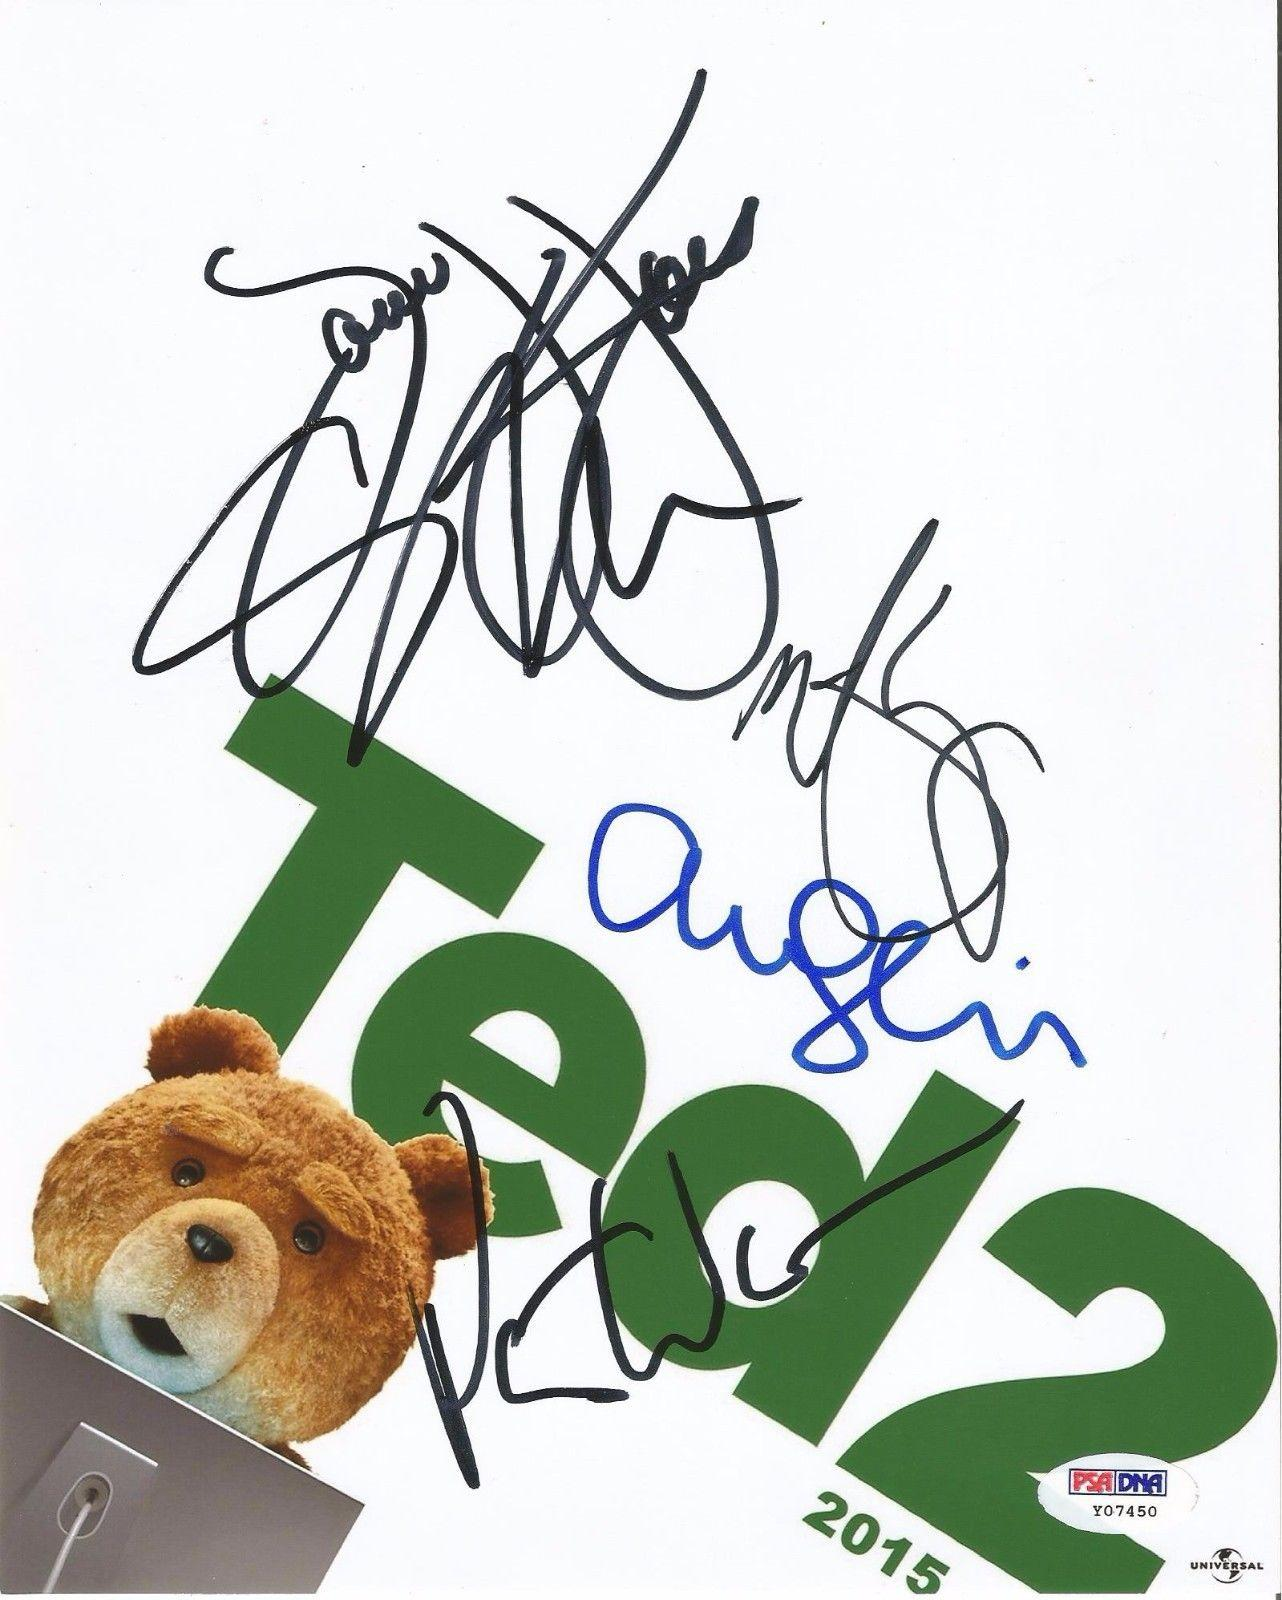 Seth Macfarlane Mark Wahlberg Seyfried Jones Signed Ted 2 8x10 Photo Psa/dna Loa